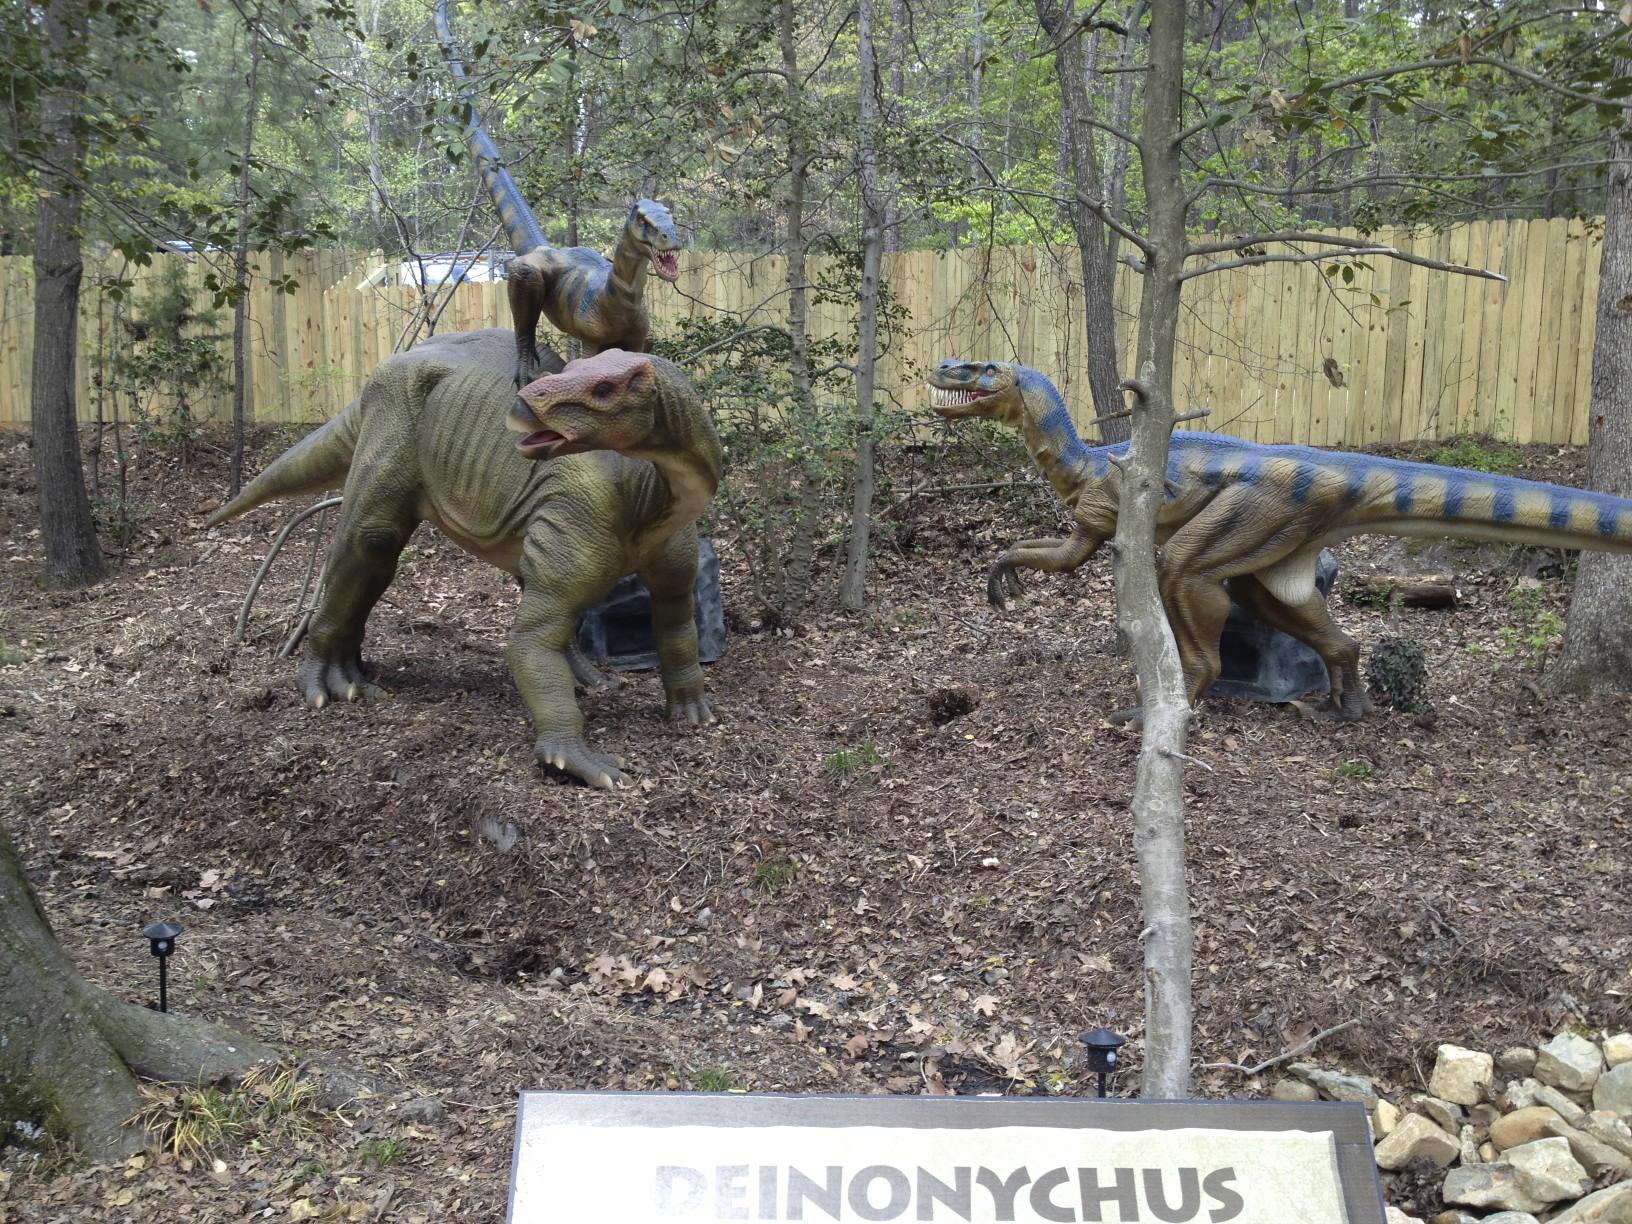 R Dinosaurs Alive Dinosaurs Alive Virgin...